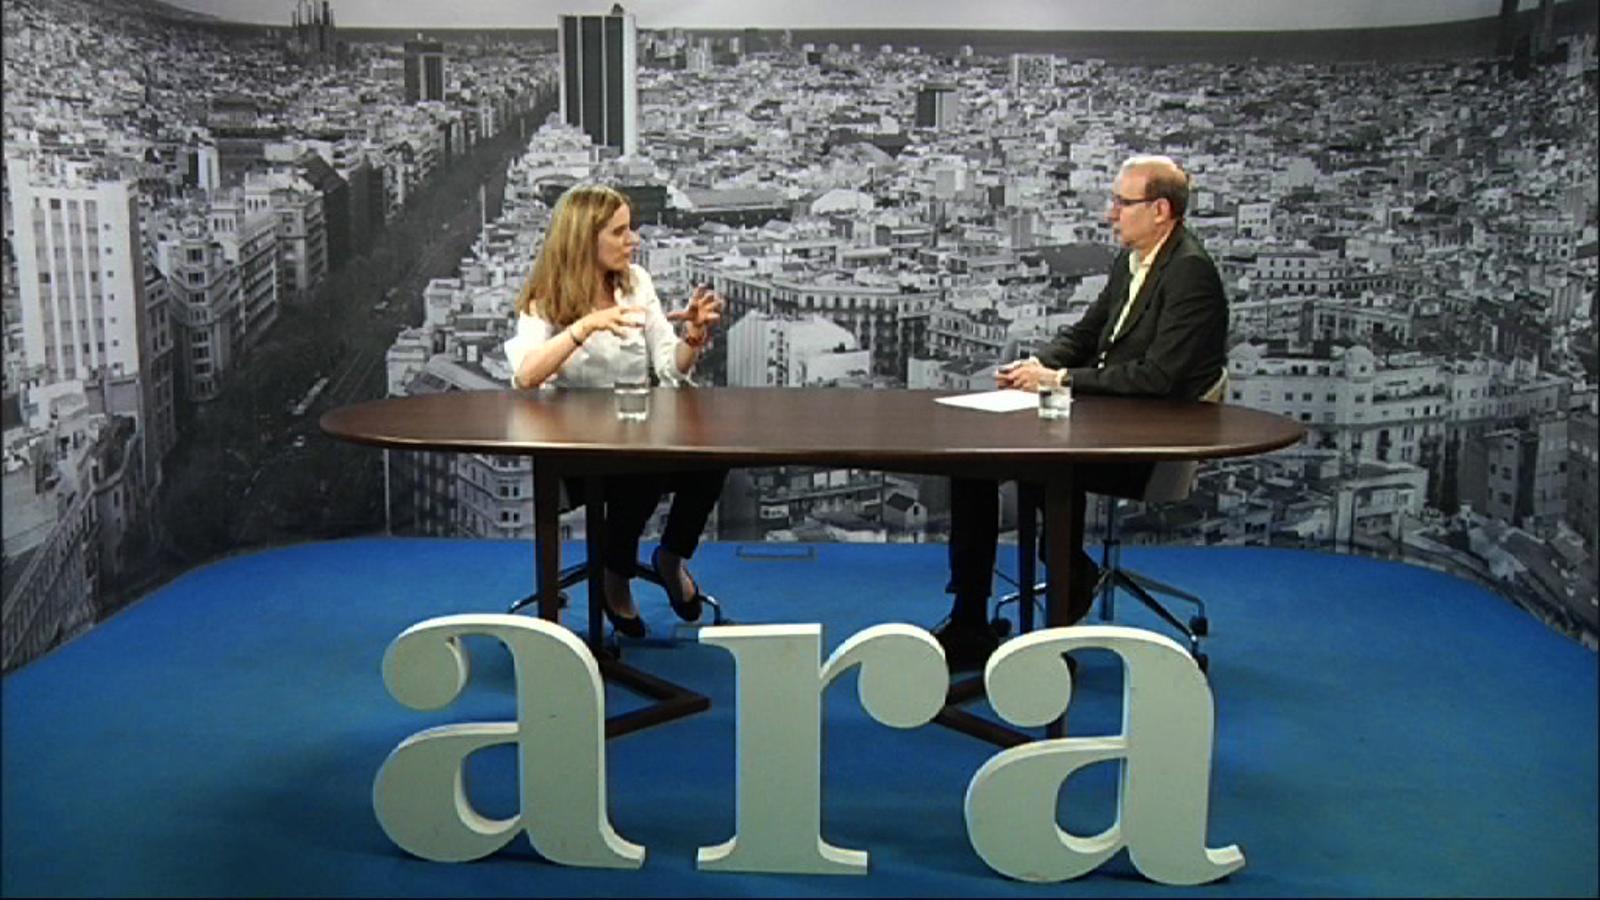 Entrevista d'Antoni Bassas a Anna Pagès